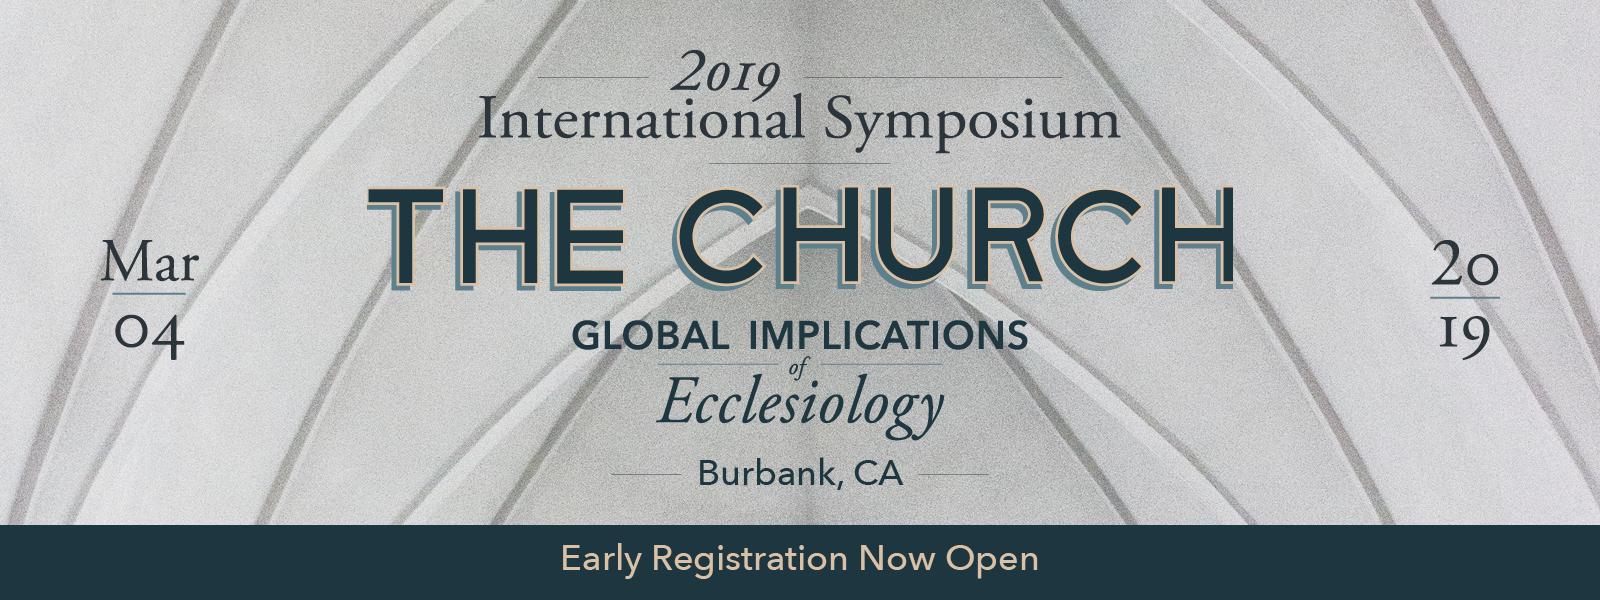 2019 International Symposium